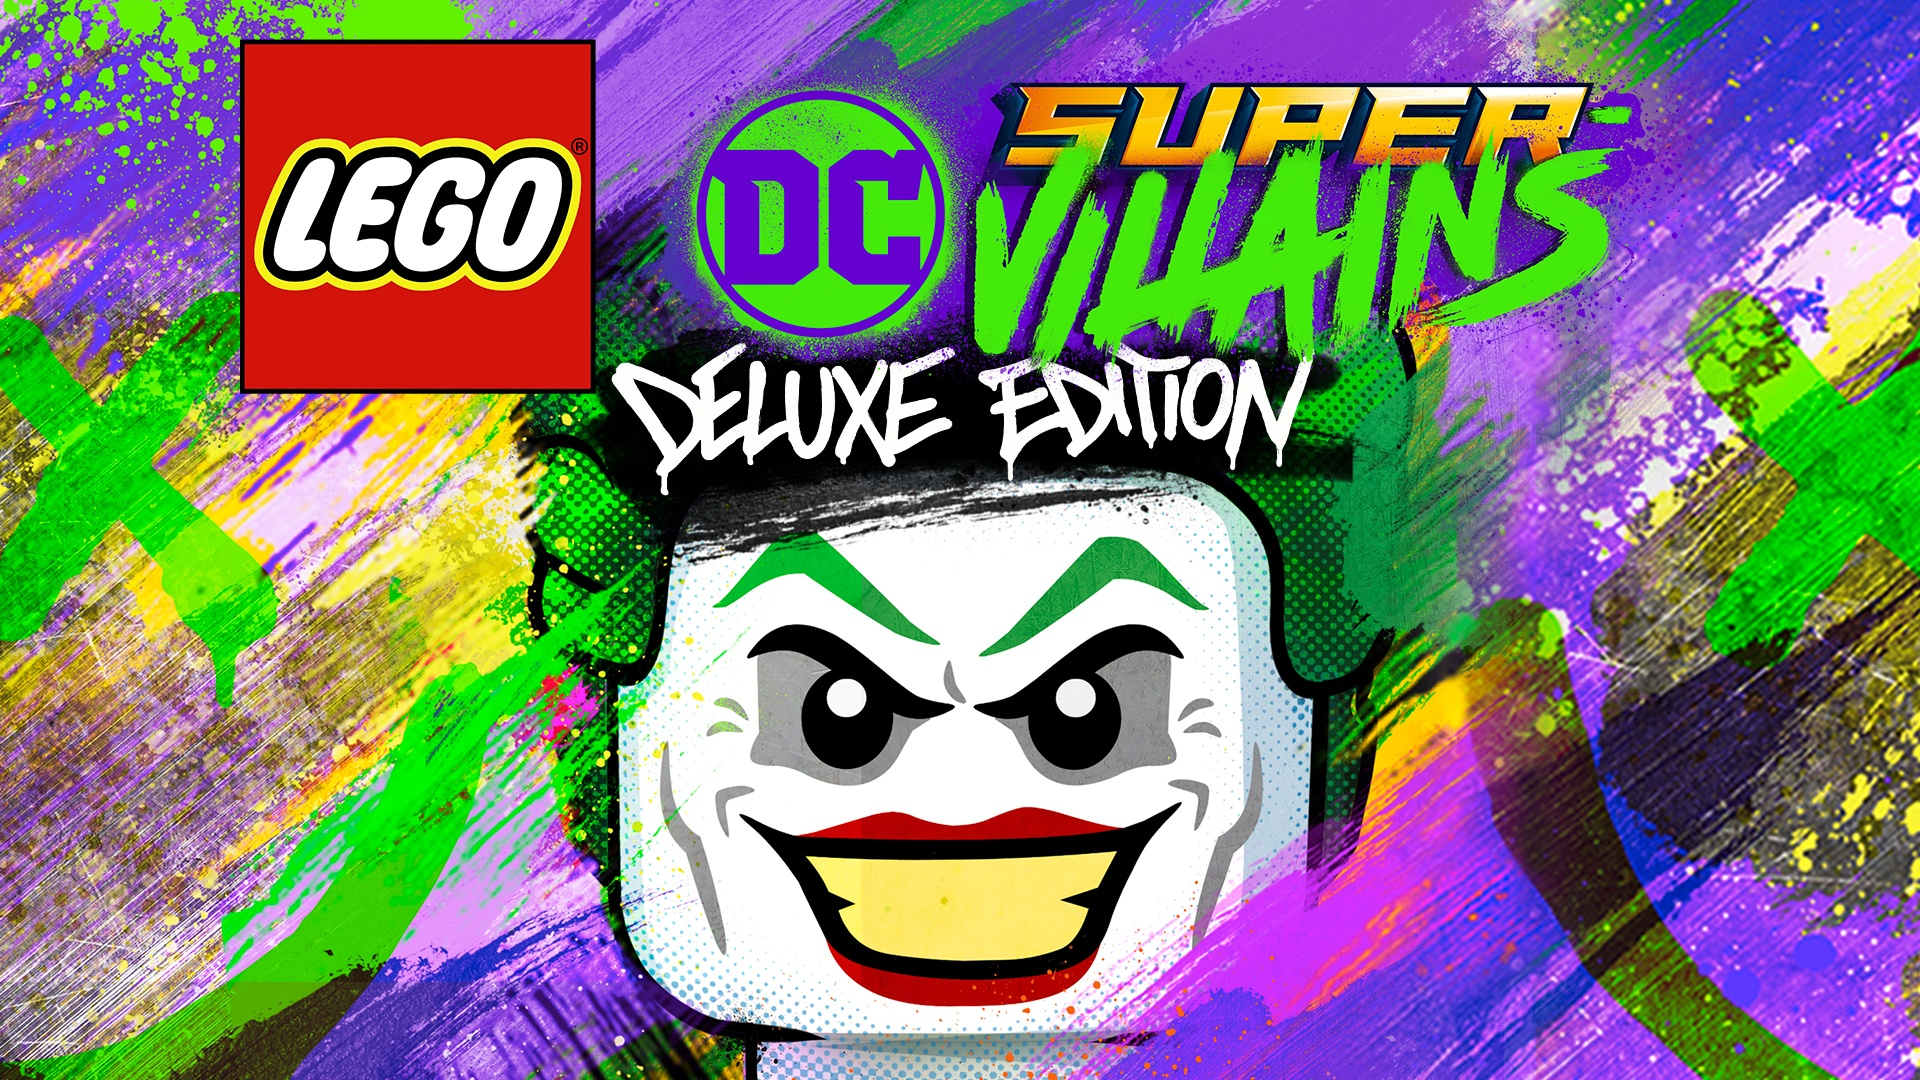 Lego Dc Super Villains Deluxe Edition Pc Steam Game Fanatical